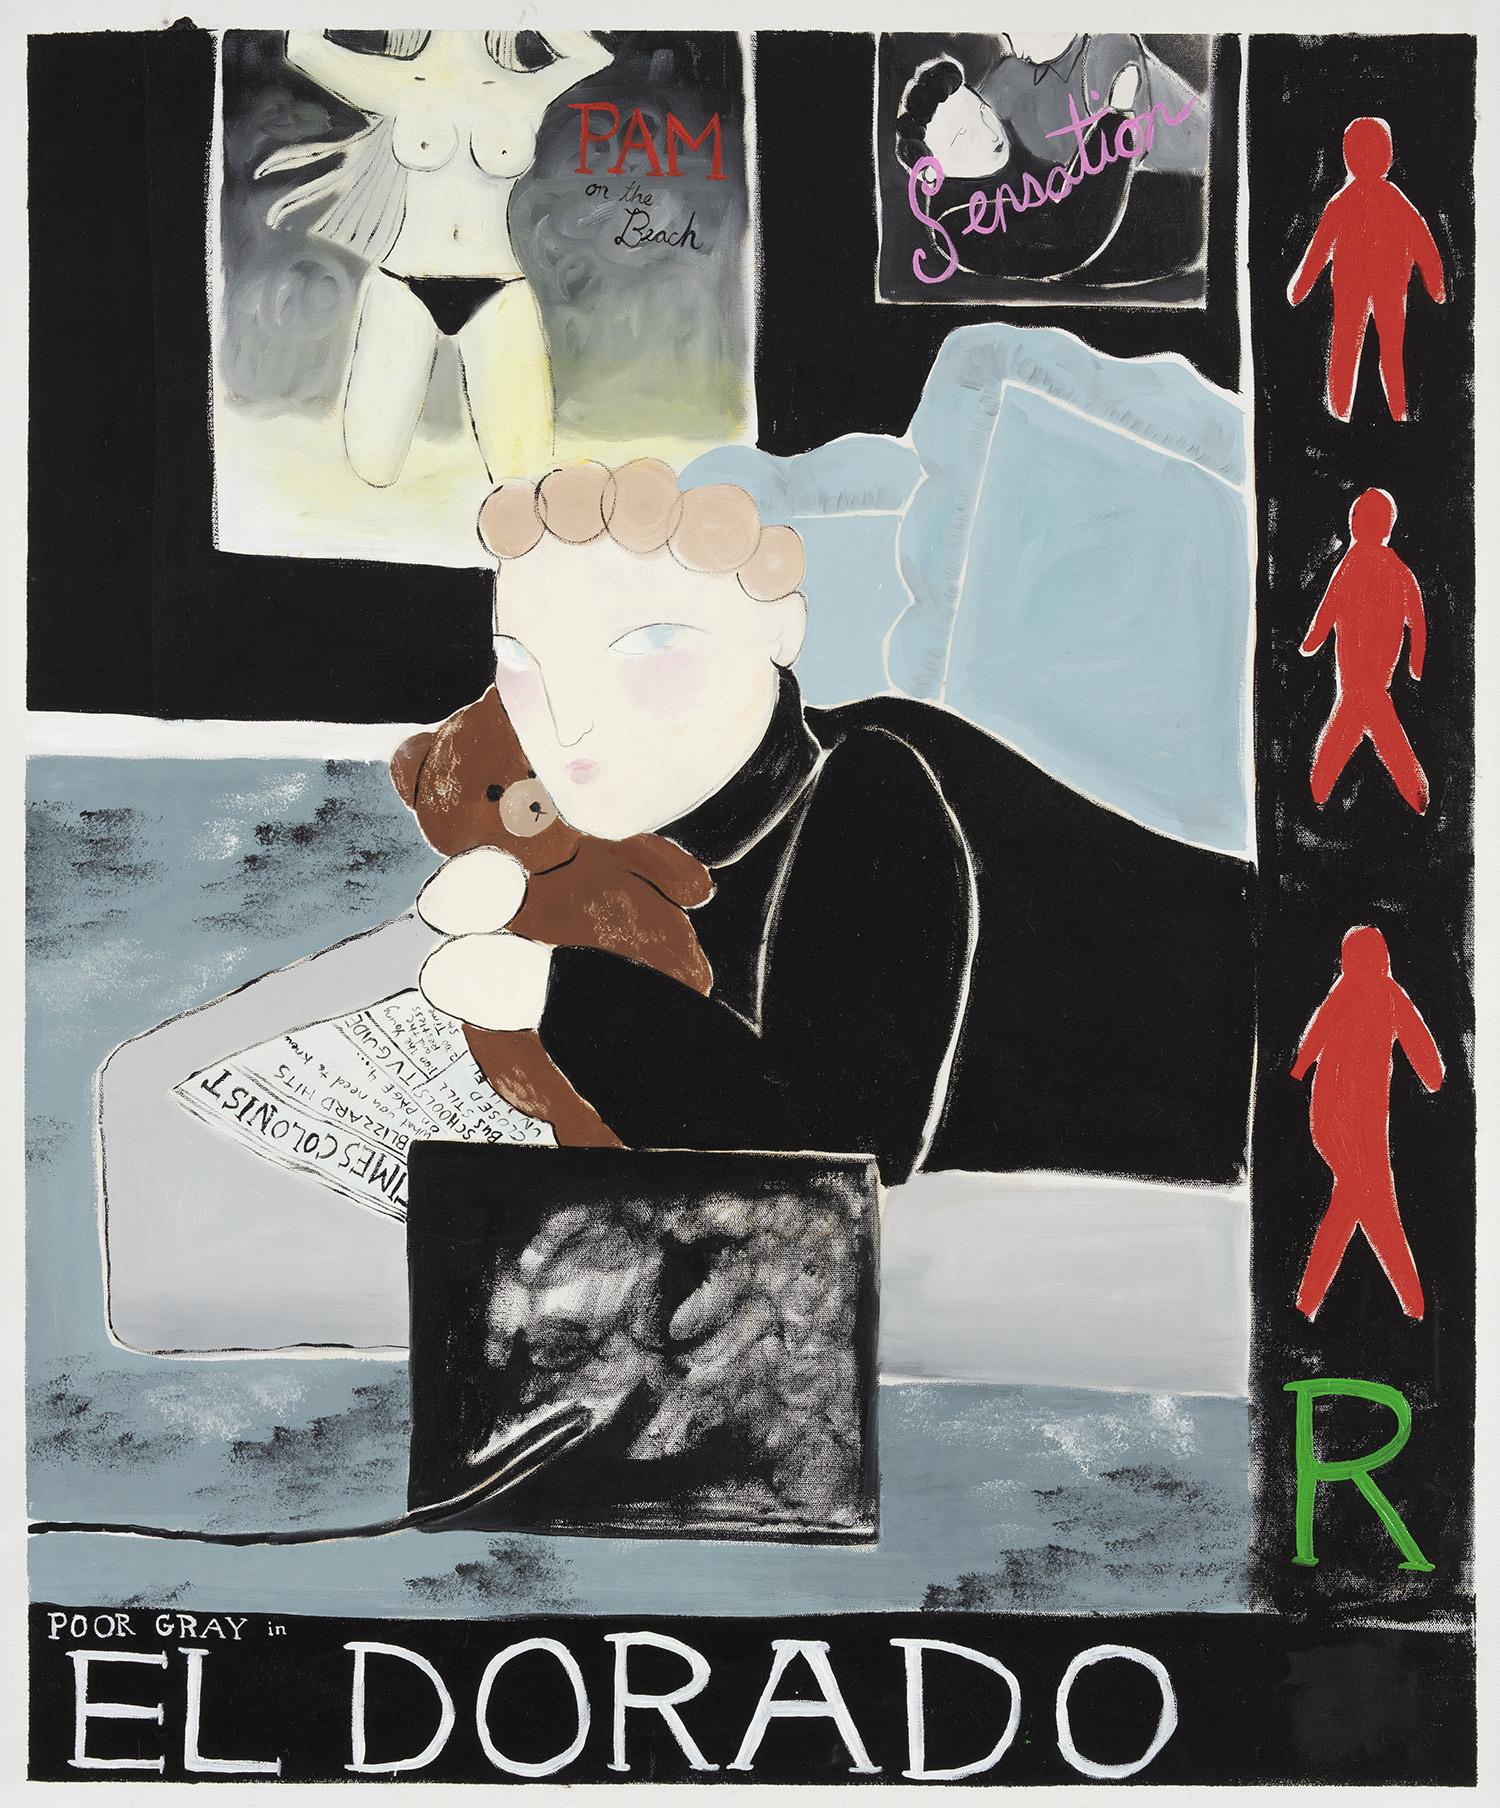 Claire Milbrath. Black Eldorado, 2018. Oil on canvas. 34 x 28 1/2 inches (86.4 x 72.4 cm)